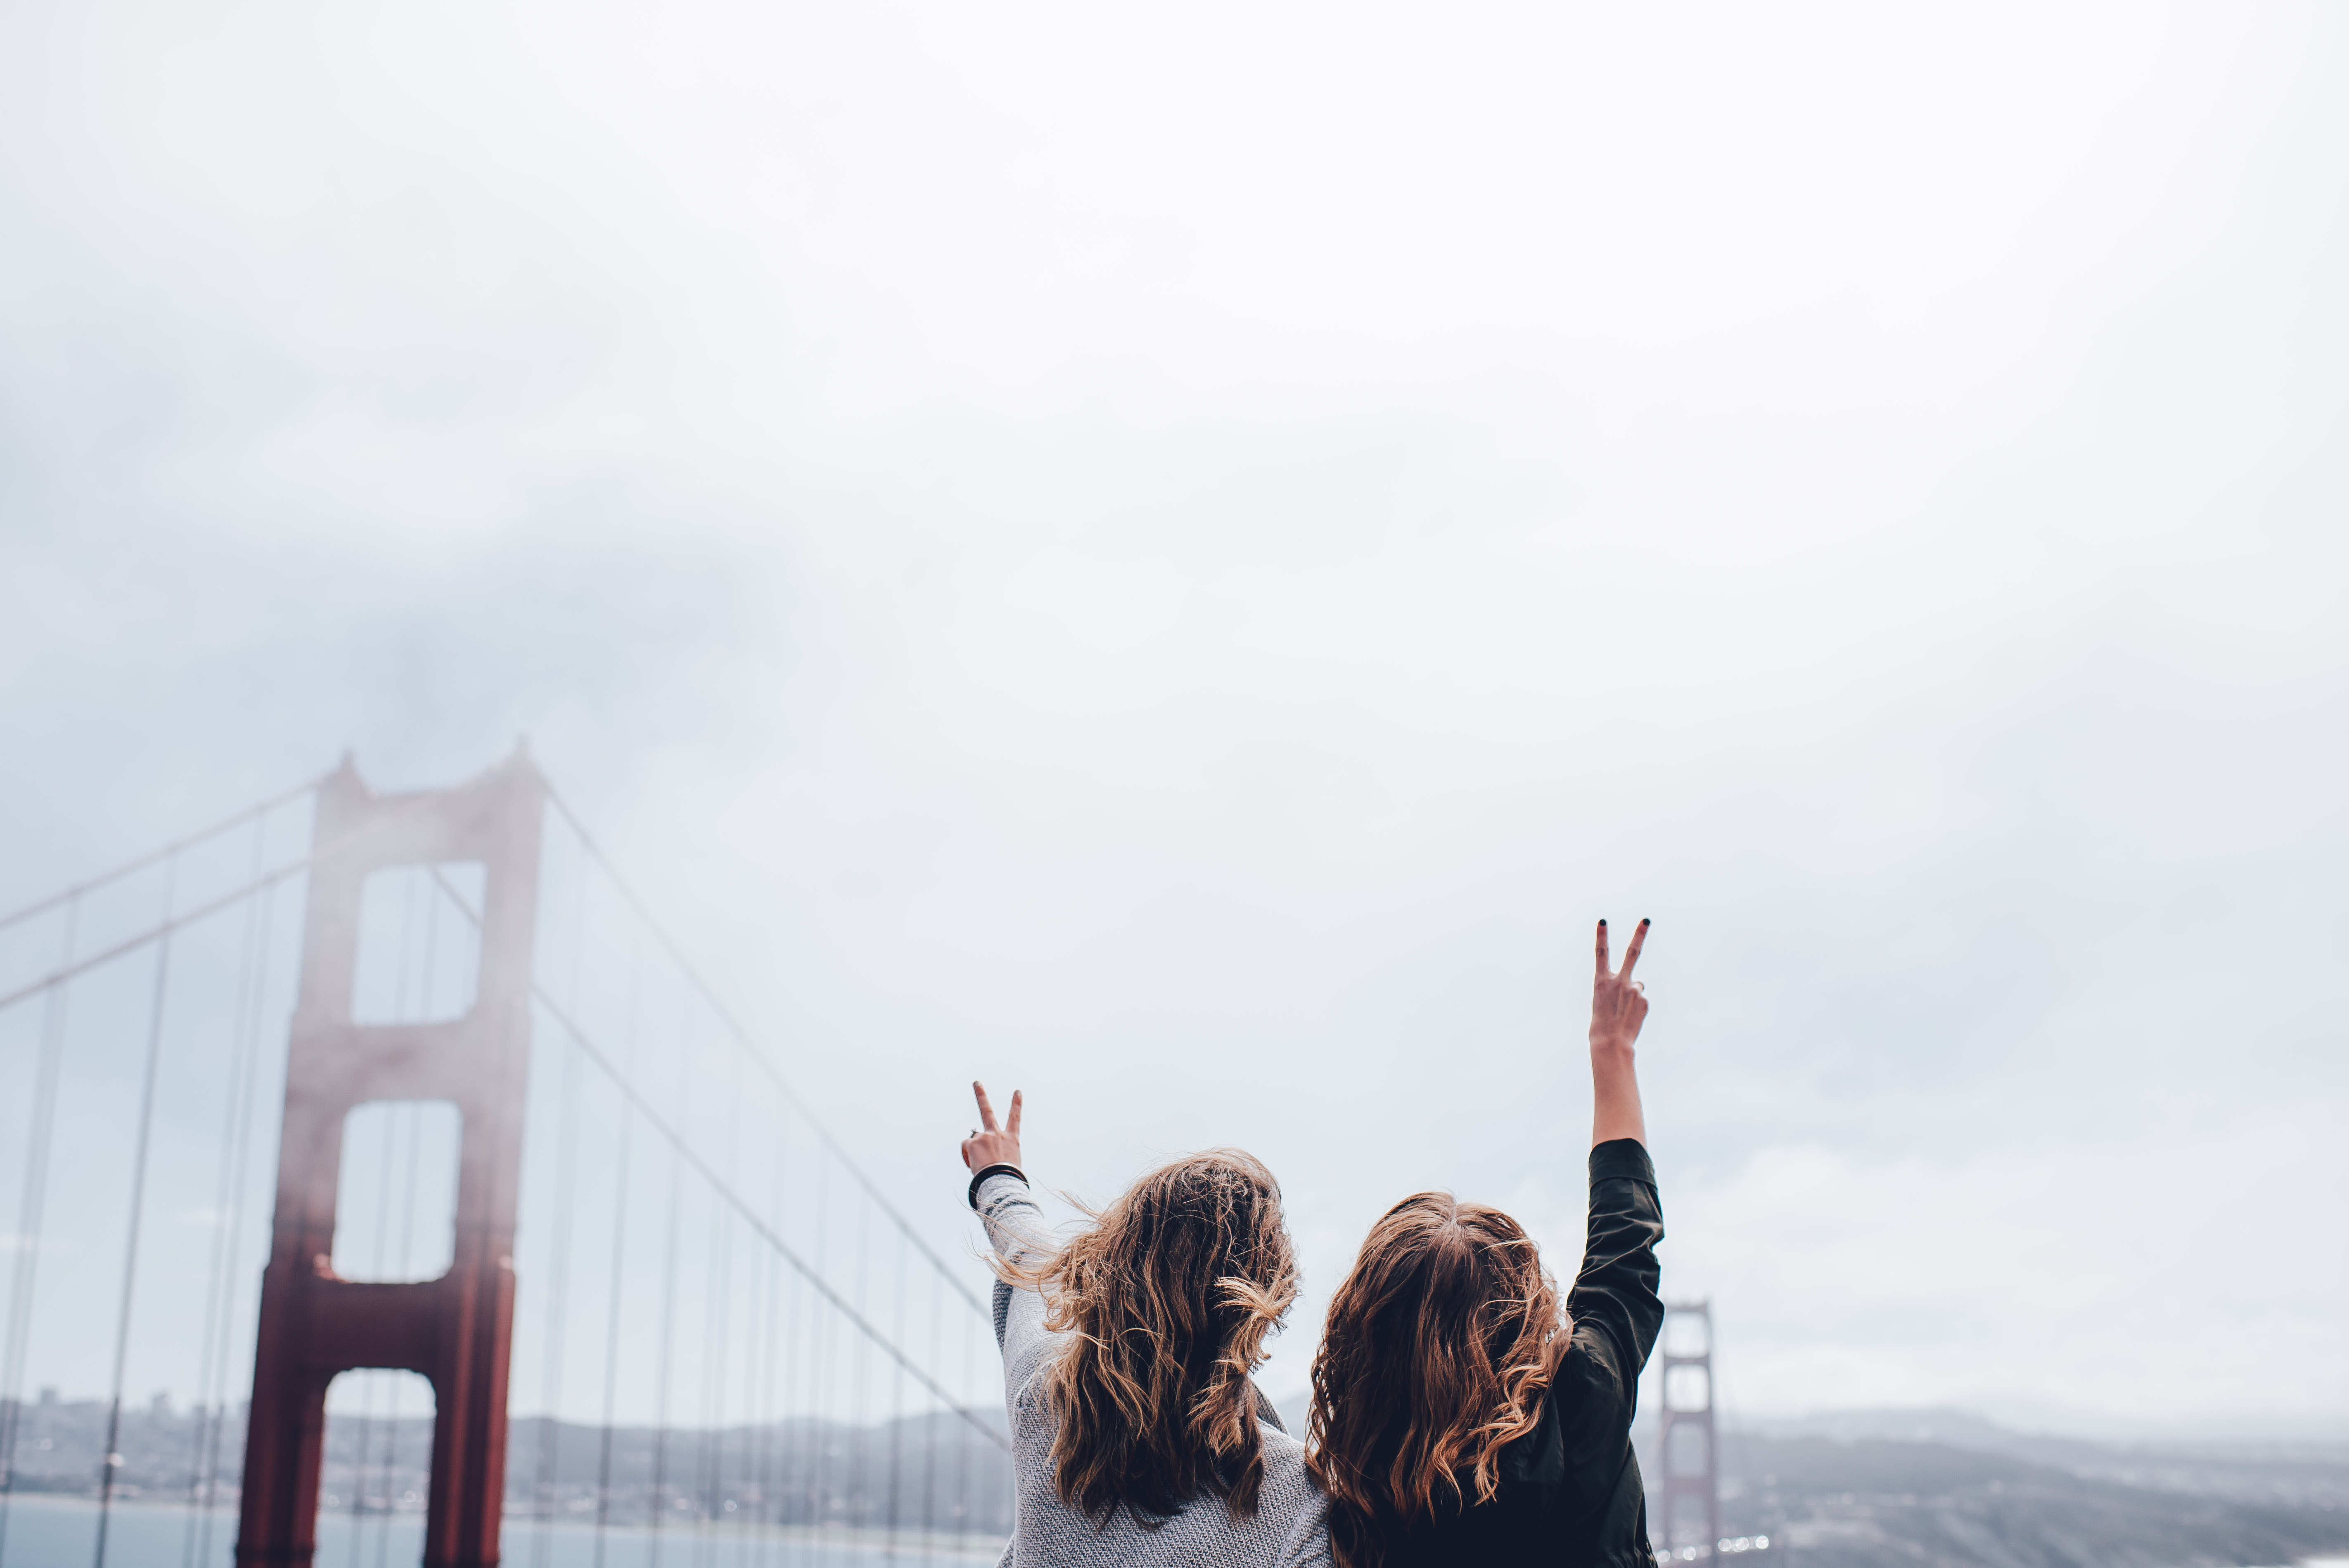 Peace sign by Golden Gate Bridge